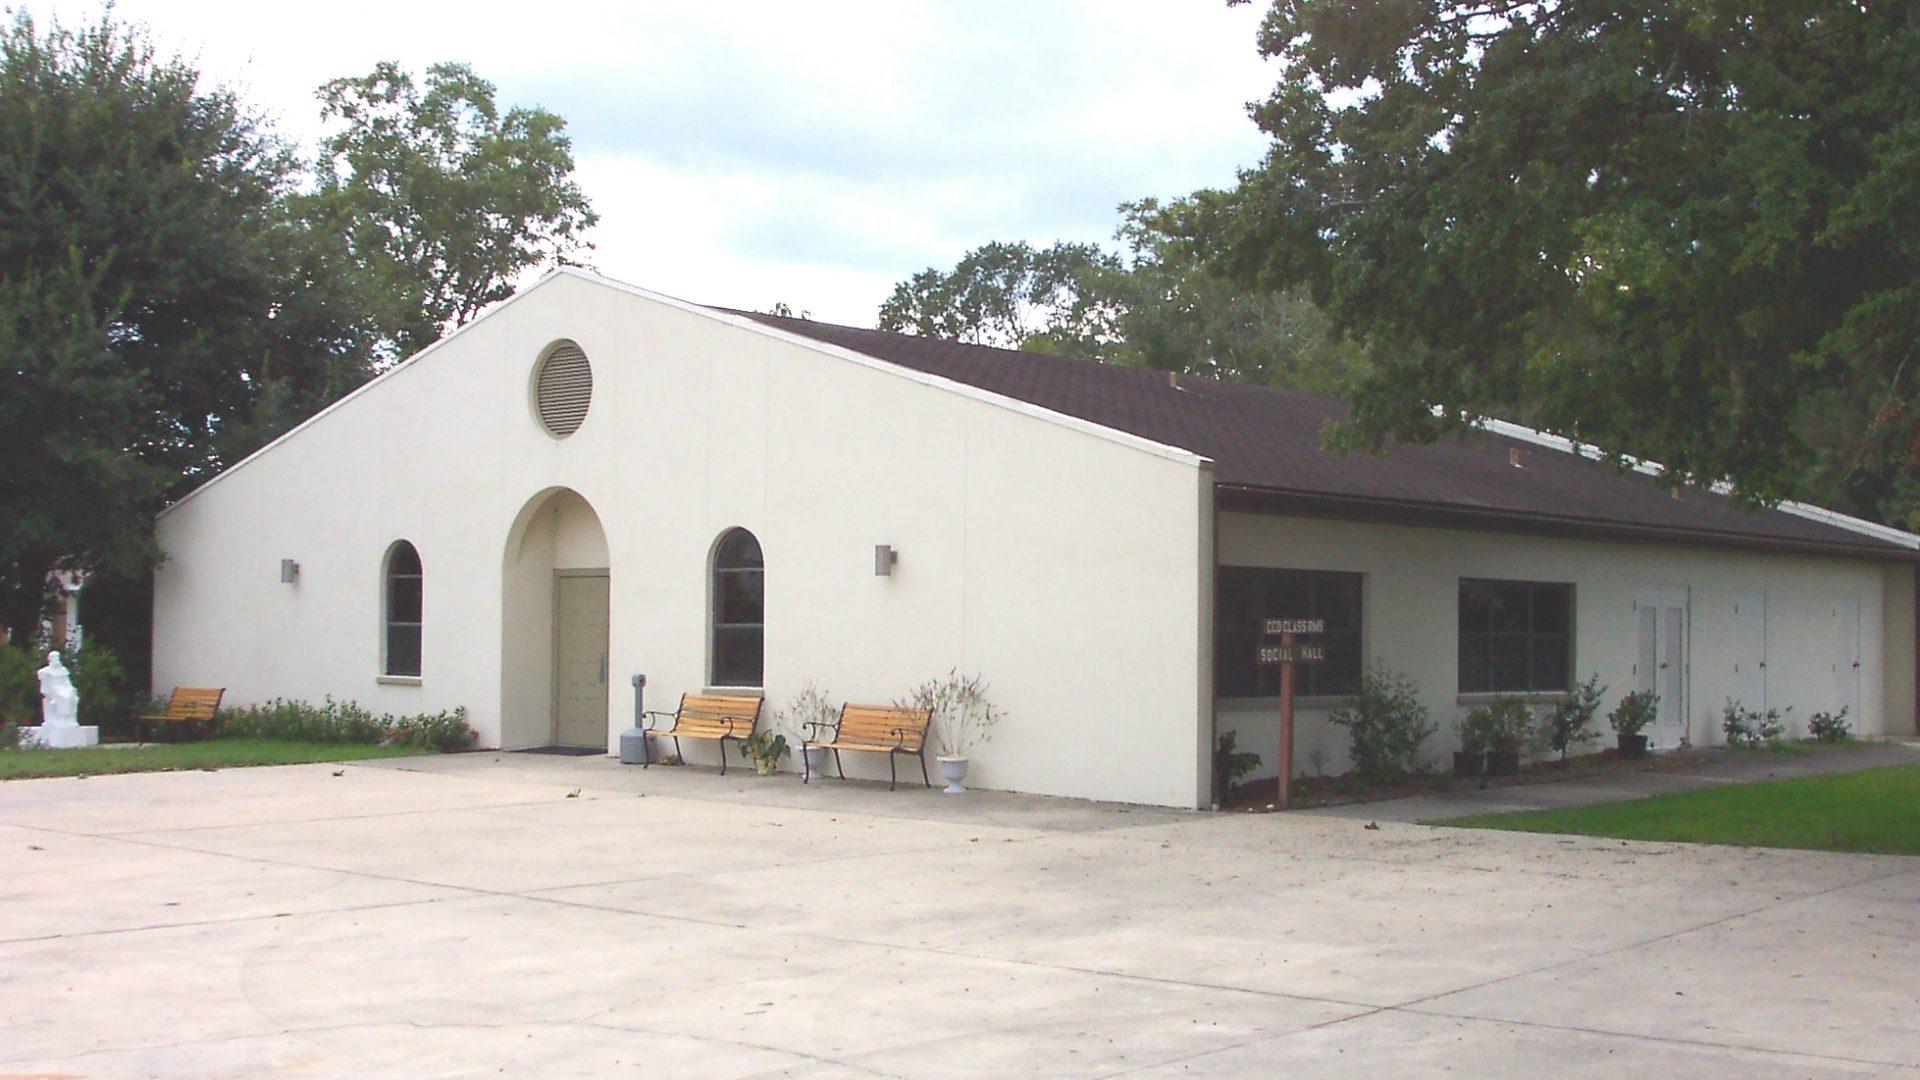 St Edwards Catholic Church Fellowship Hall, Starke, Fla.